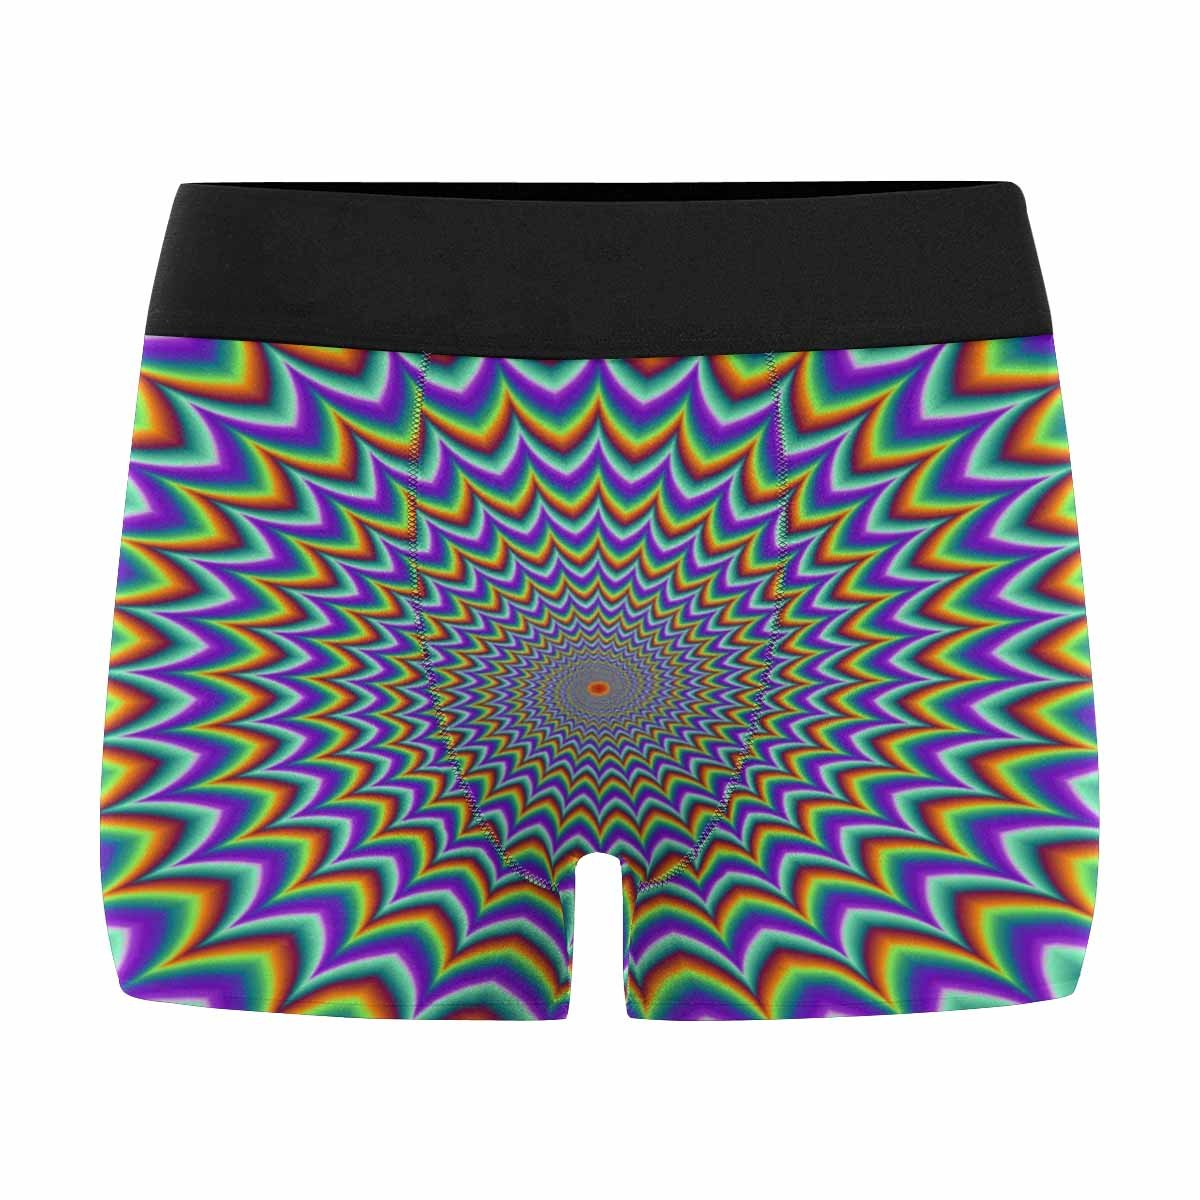 INTERESTPRINT Boxer Briefs Mens Underwear Pulsing Fiery Spirals Optical Illusion of Movement XS-3XL